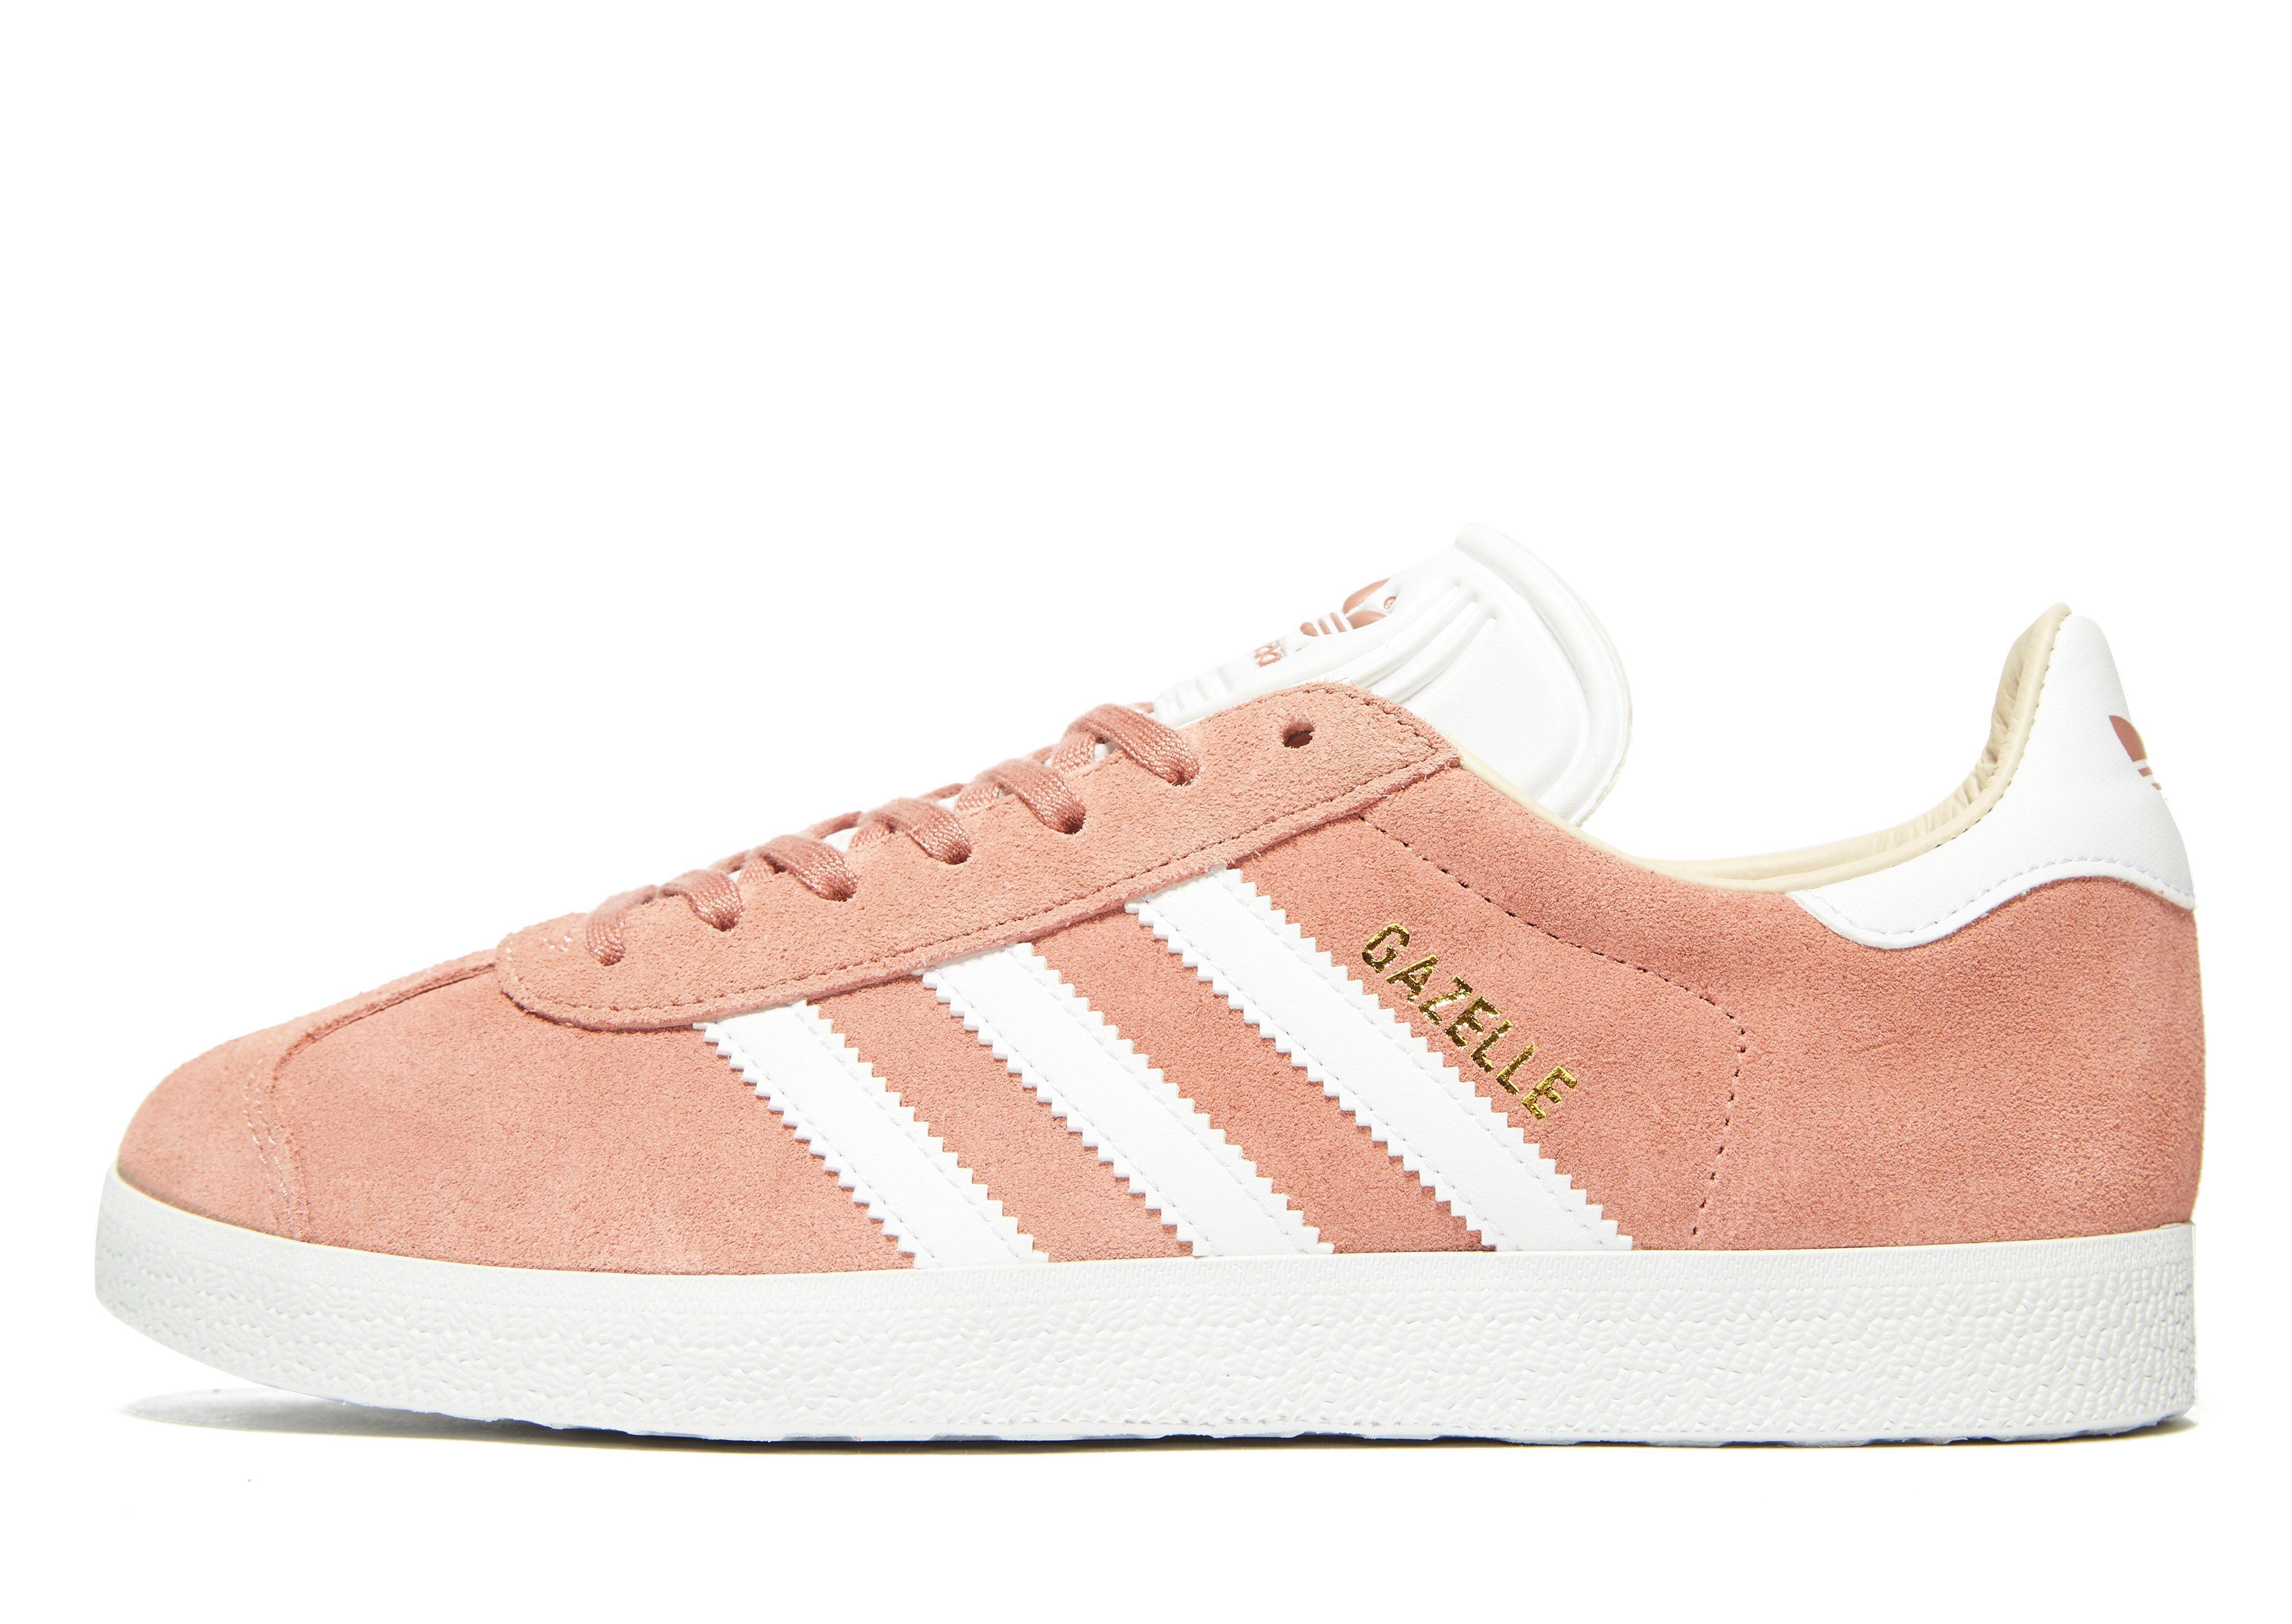 Lyst Adidas Originali Gazzella In Rosa Salva Il 26%